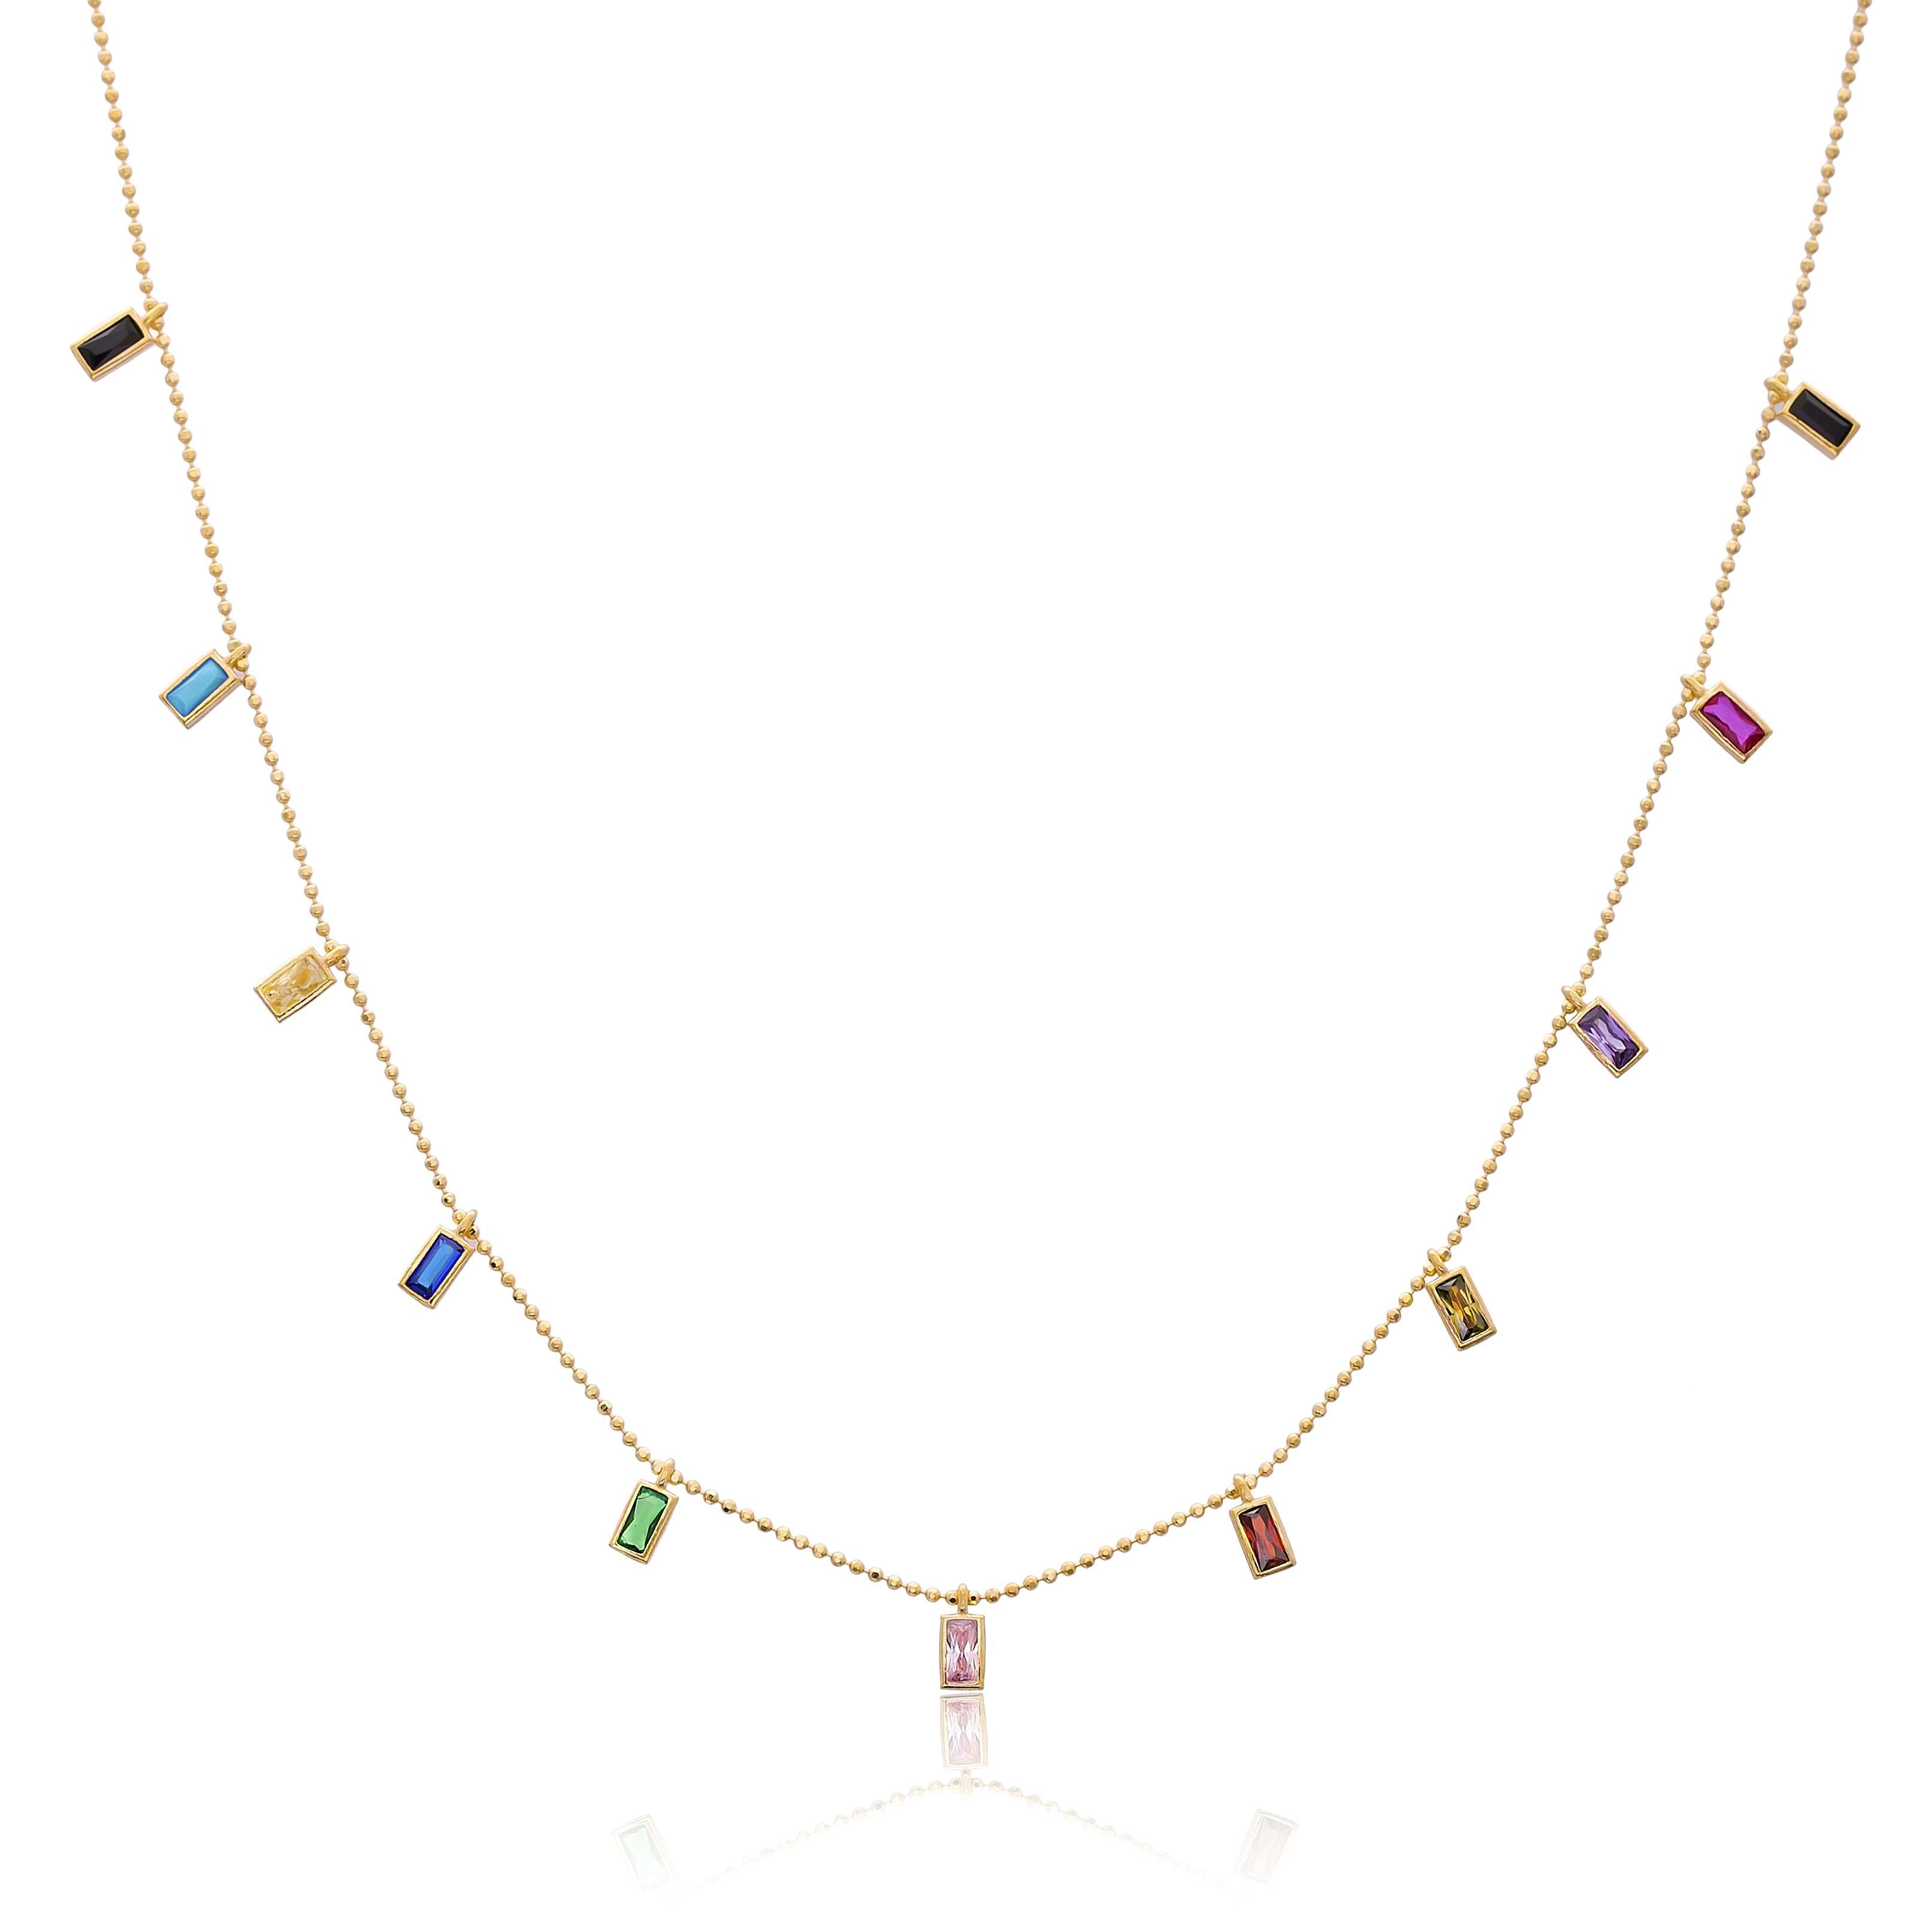 14K Gold Elegant Shaker Baguette Shape Stone Pendant Wholesale Handmade Turkish Jewelry